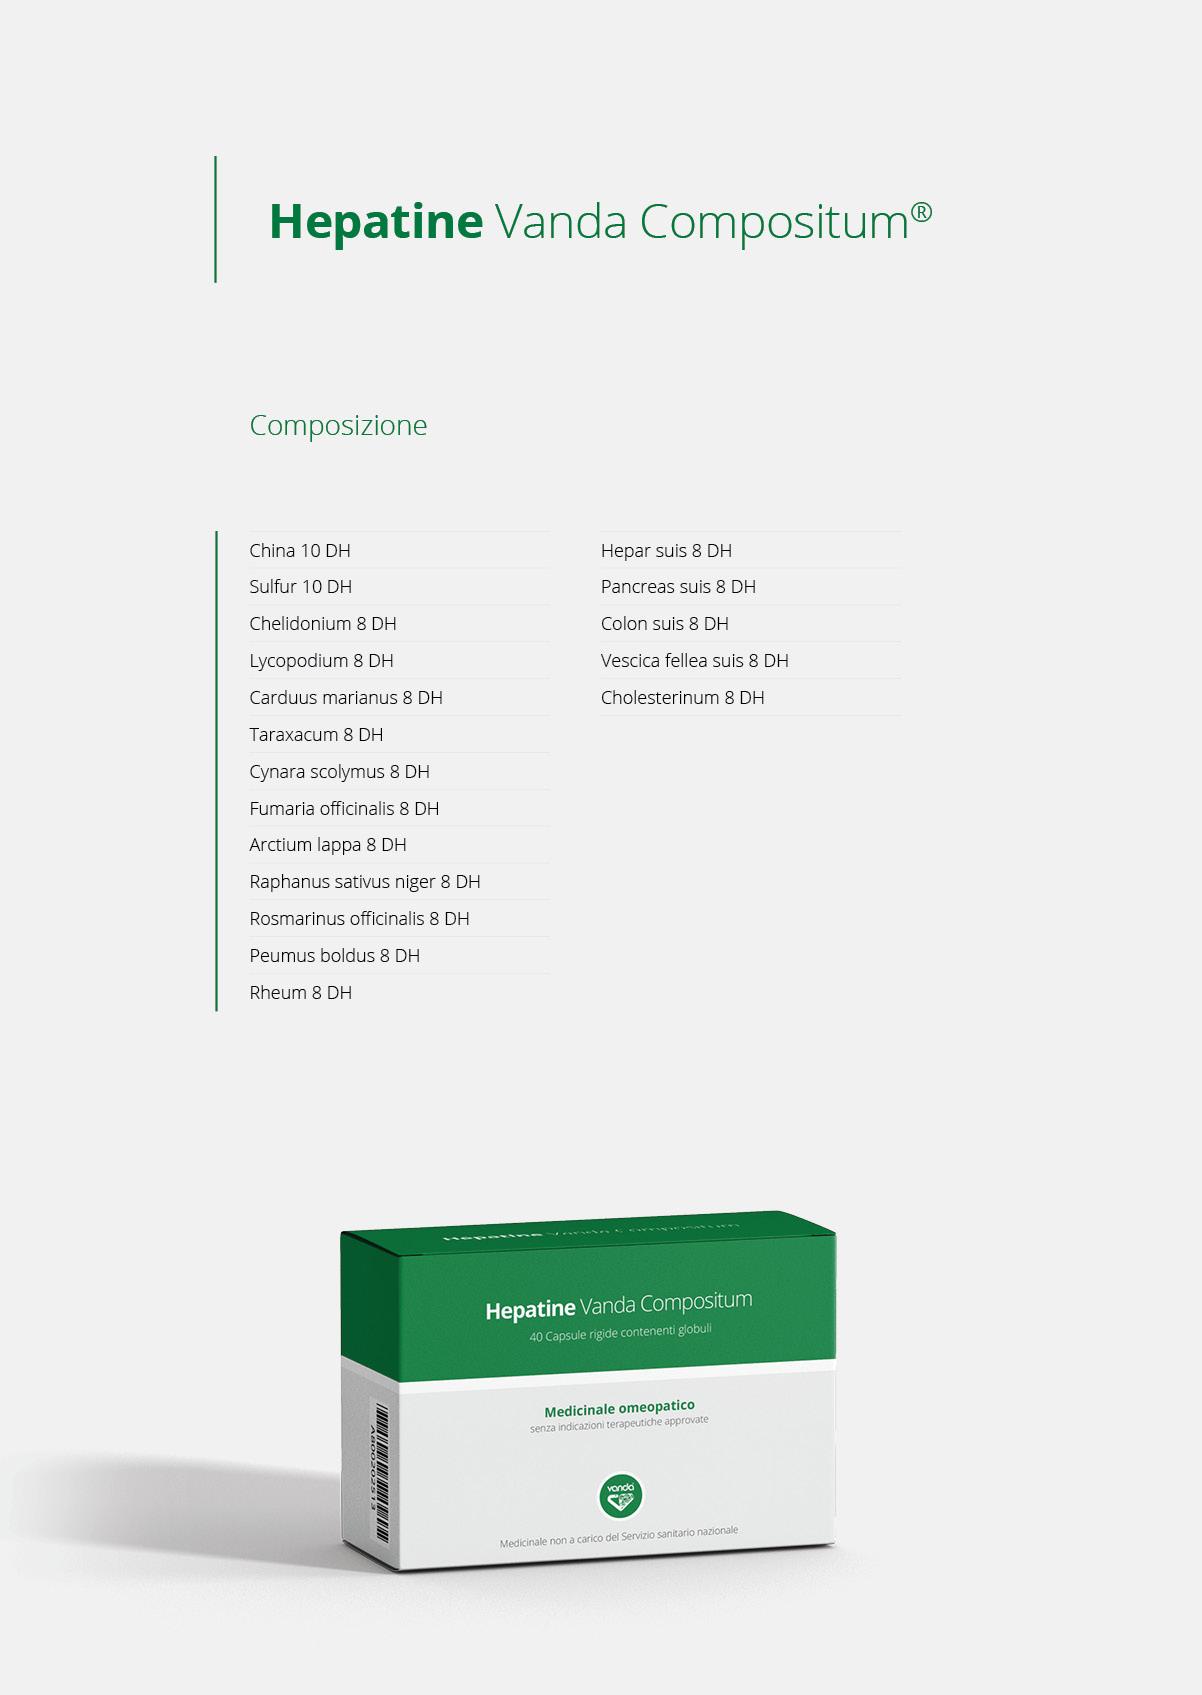 Hepatine medicinale omeopatico